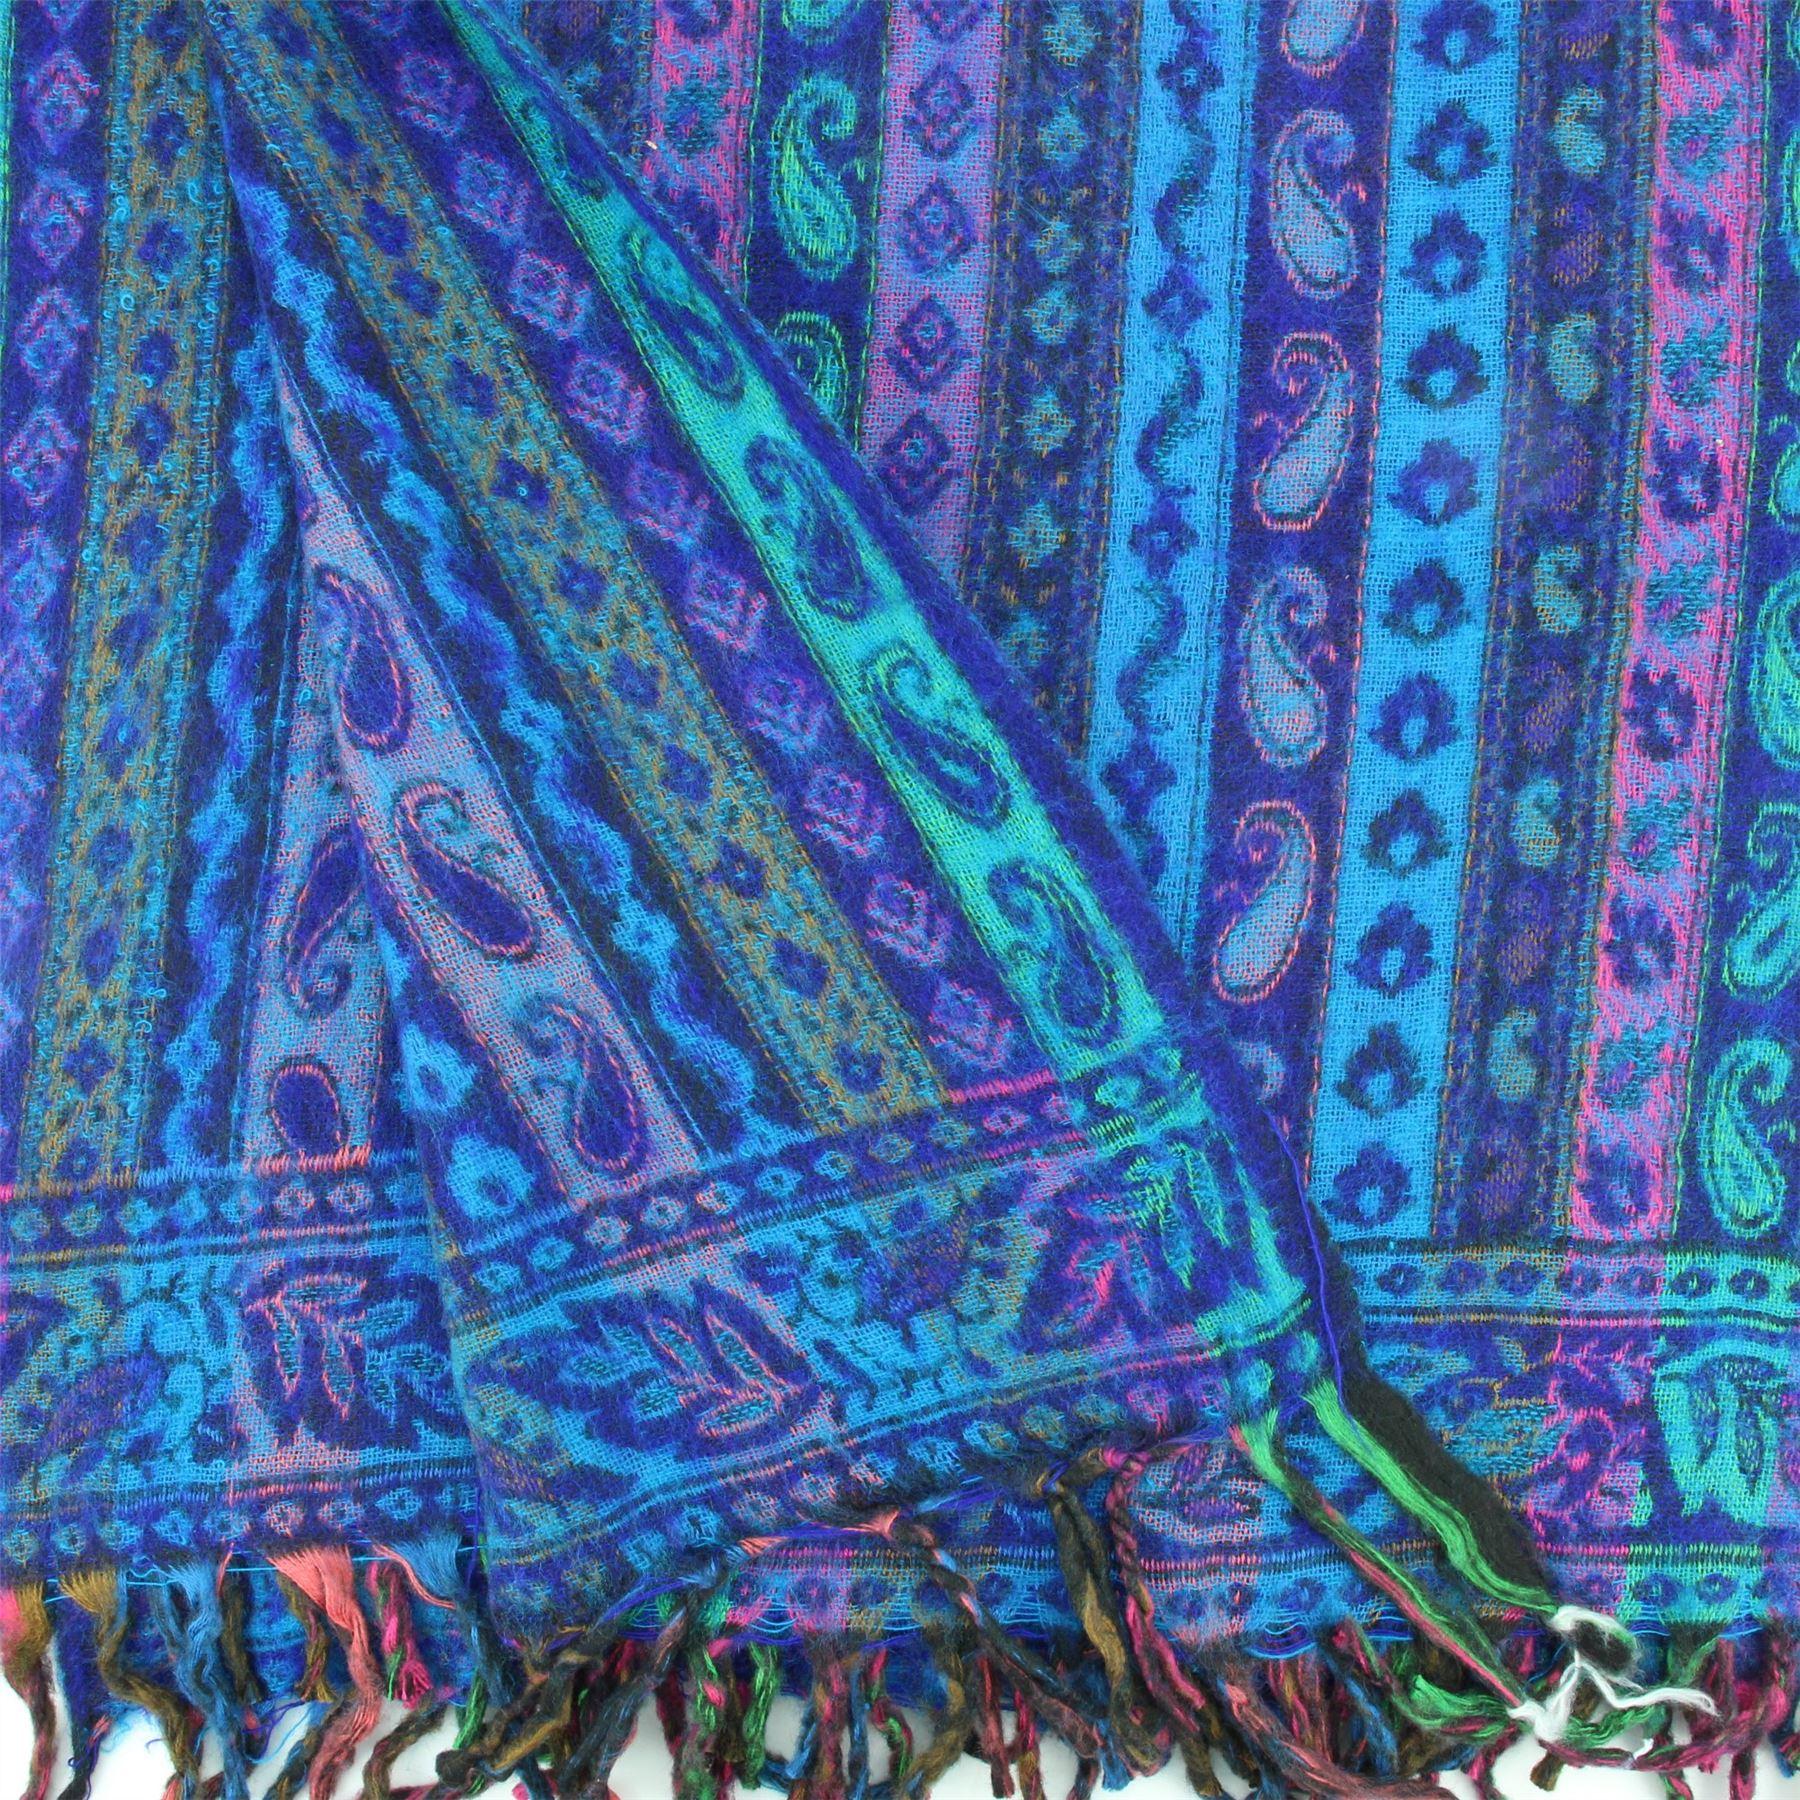 Acrylic-Wool-Blanket-Shawl-Wrap-Throw-Finest-Softest-India-Stripe-Paisley-Travel thumbnail 6